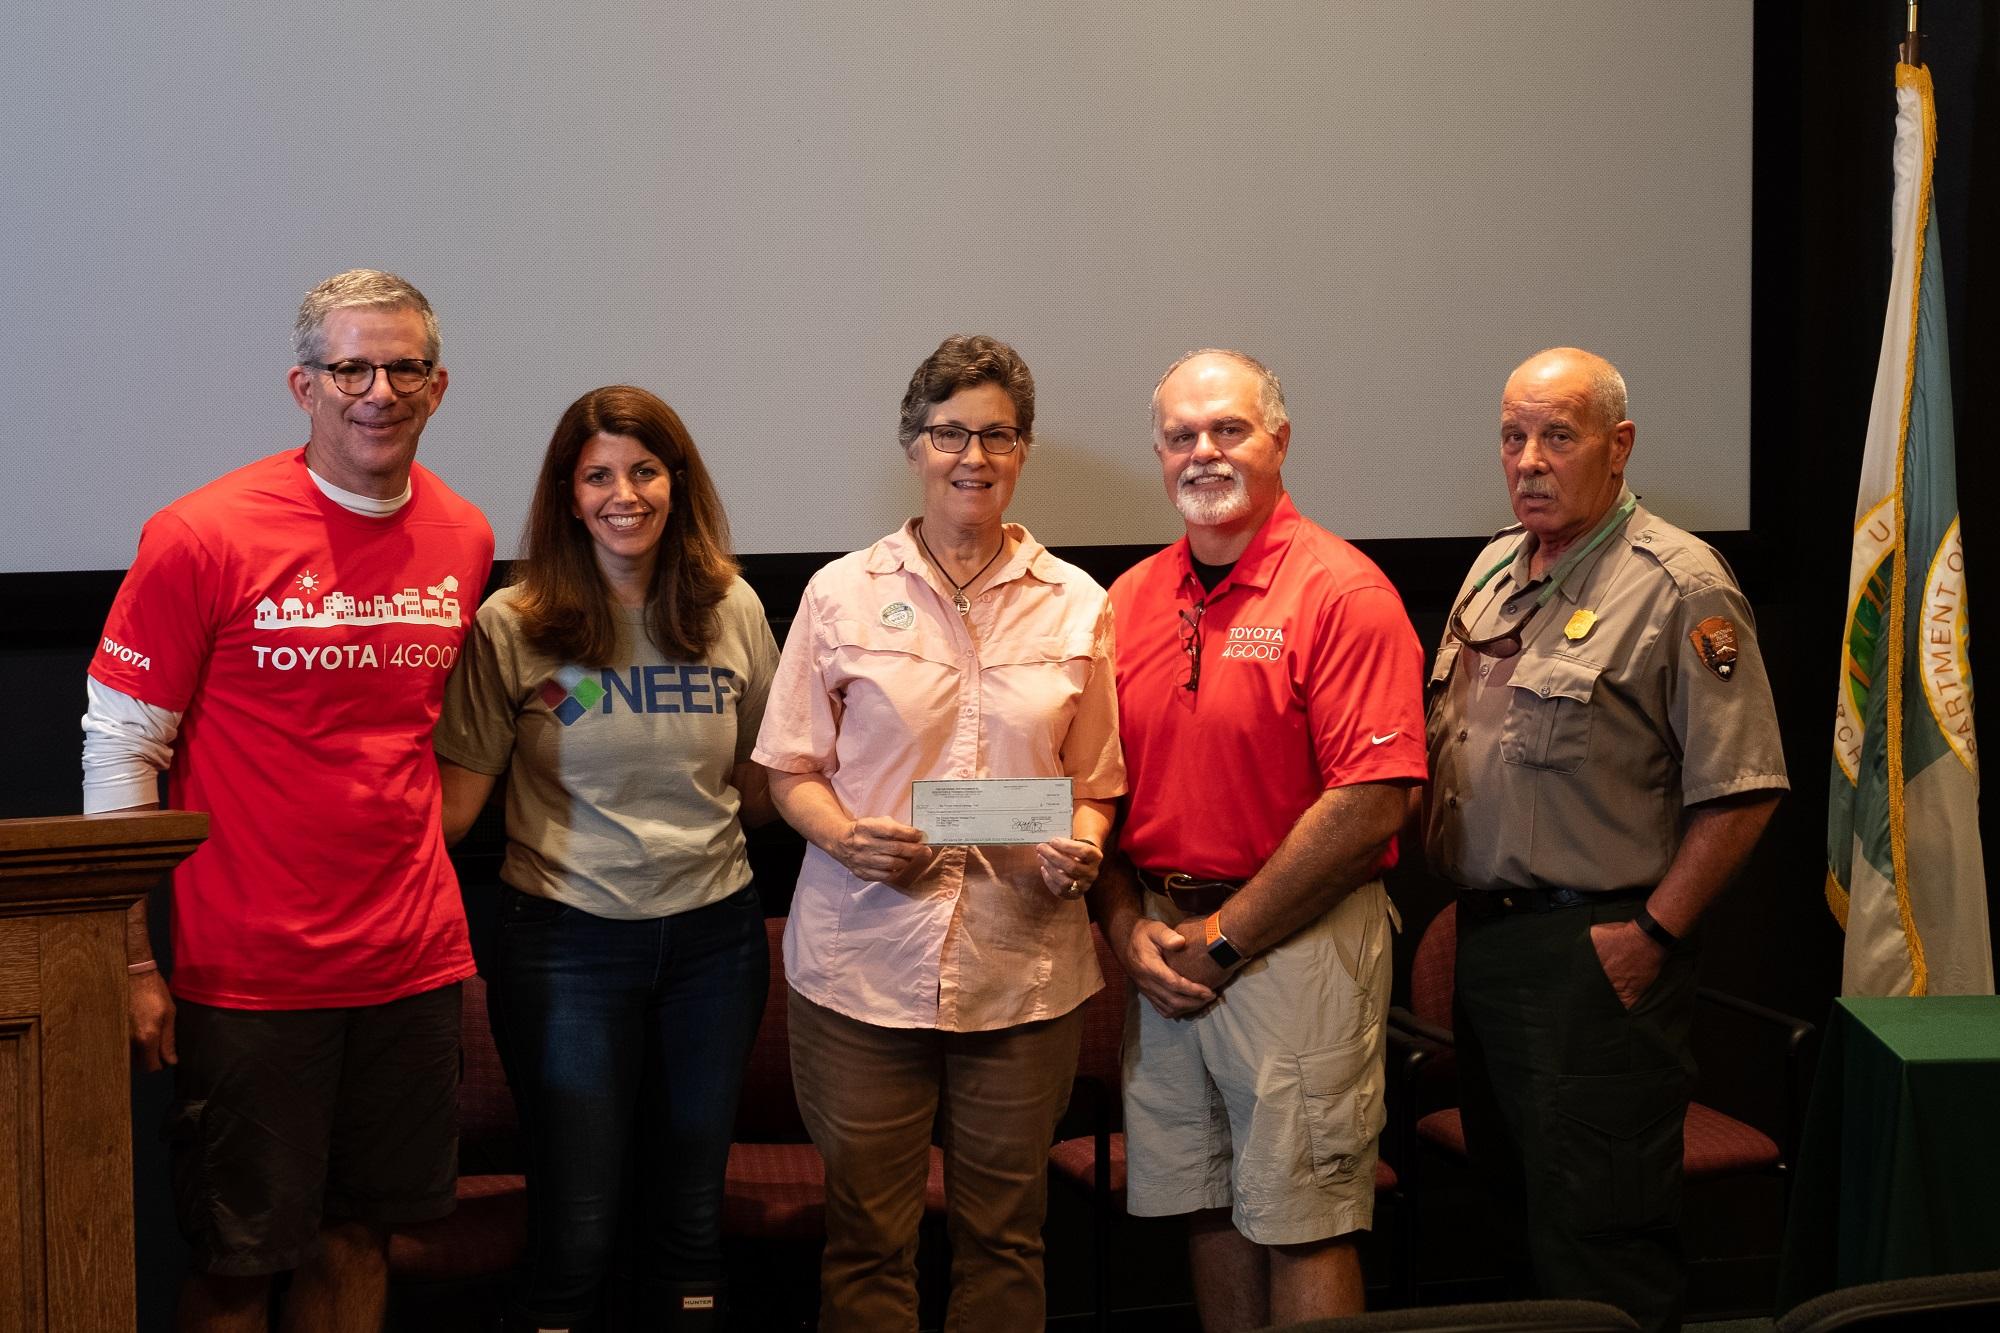 National Environmental Education Foundation and Toyota Award